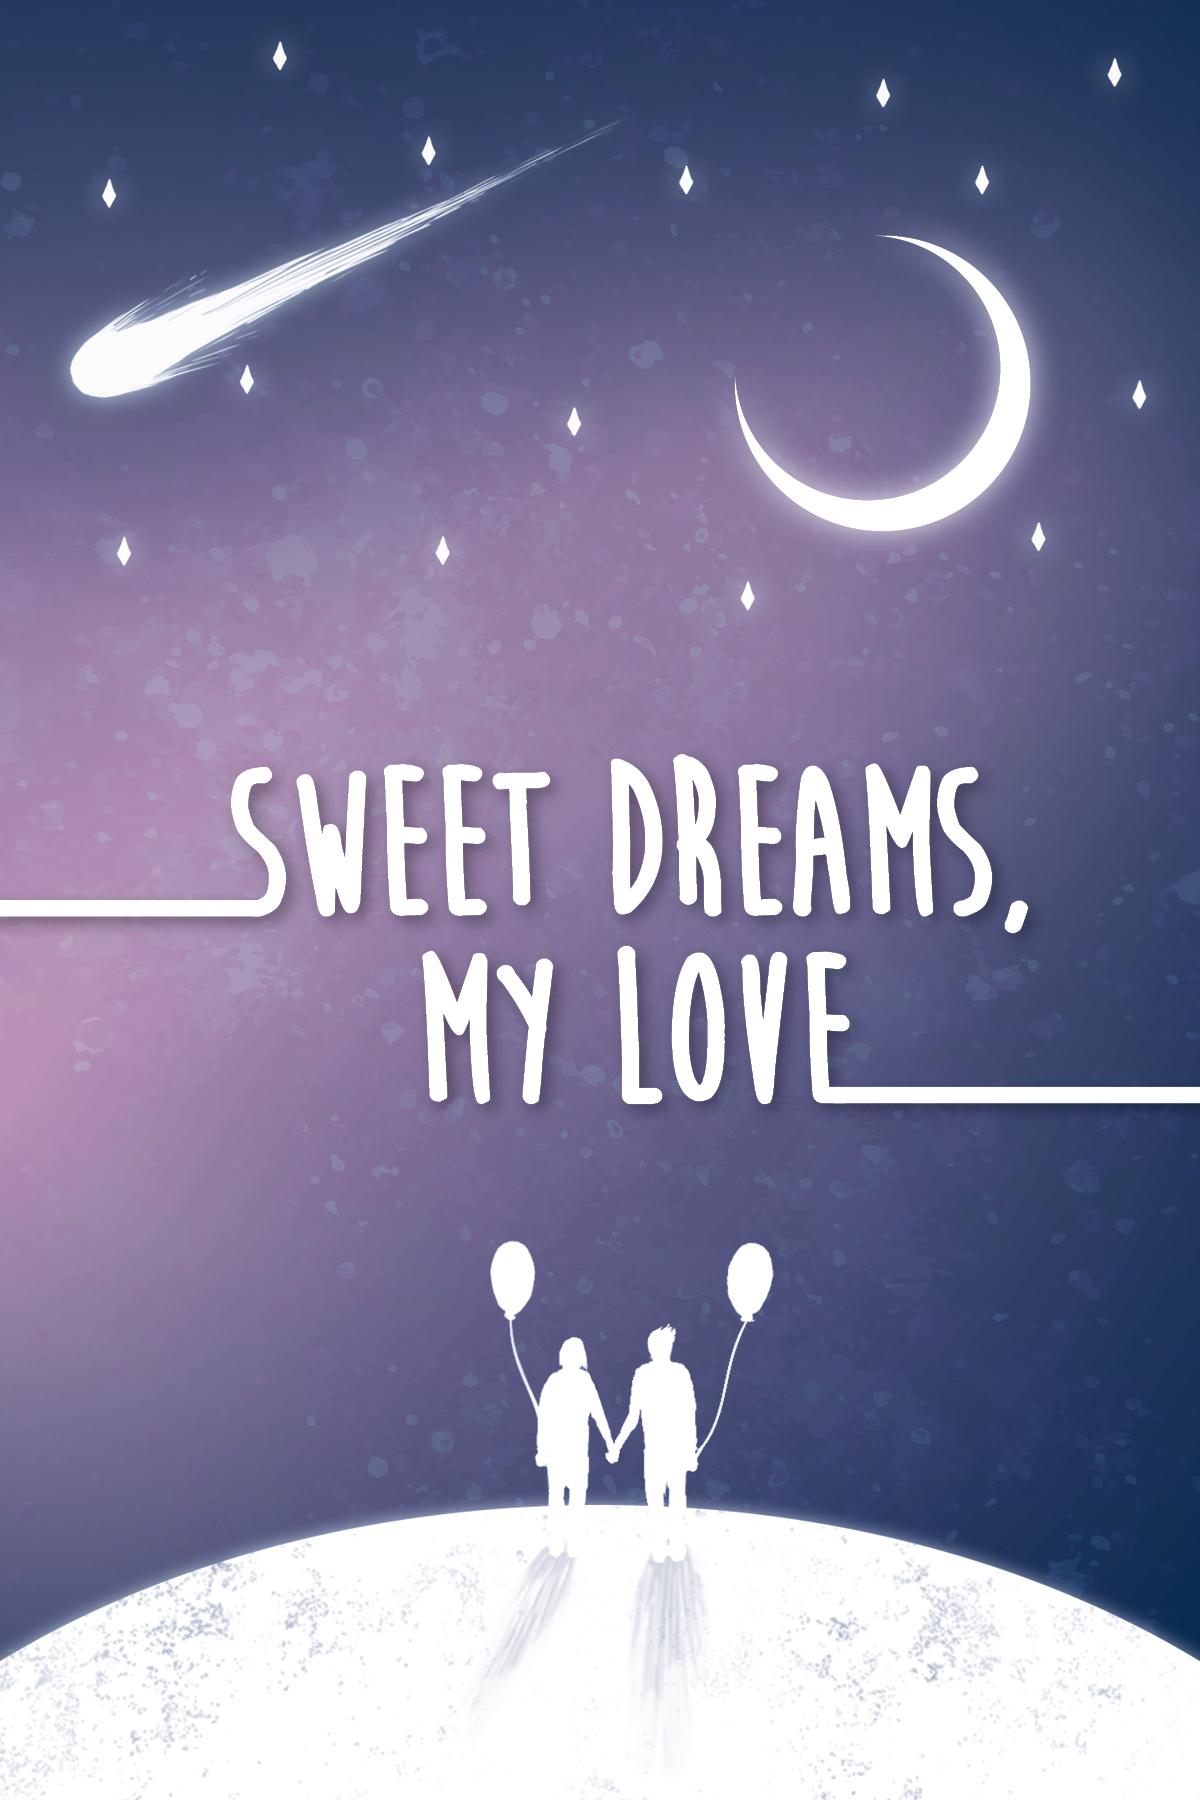 Myd Loves Classic Wedding Nails: Sweet Dreams, My Love. On Behance